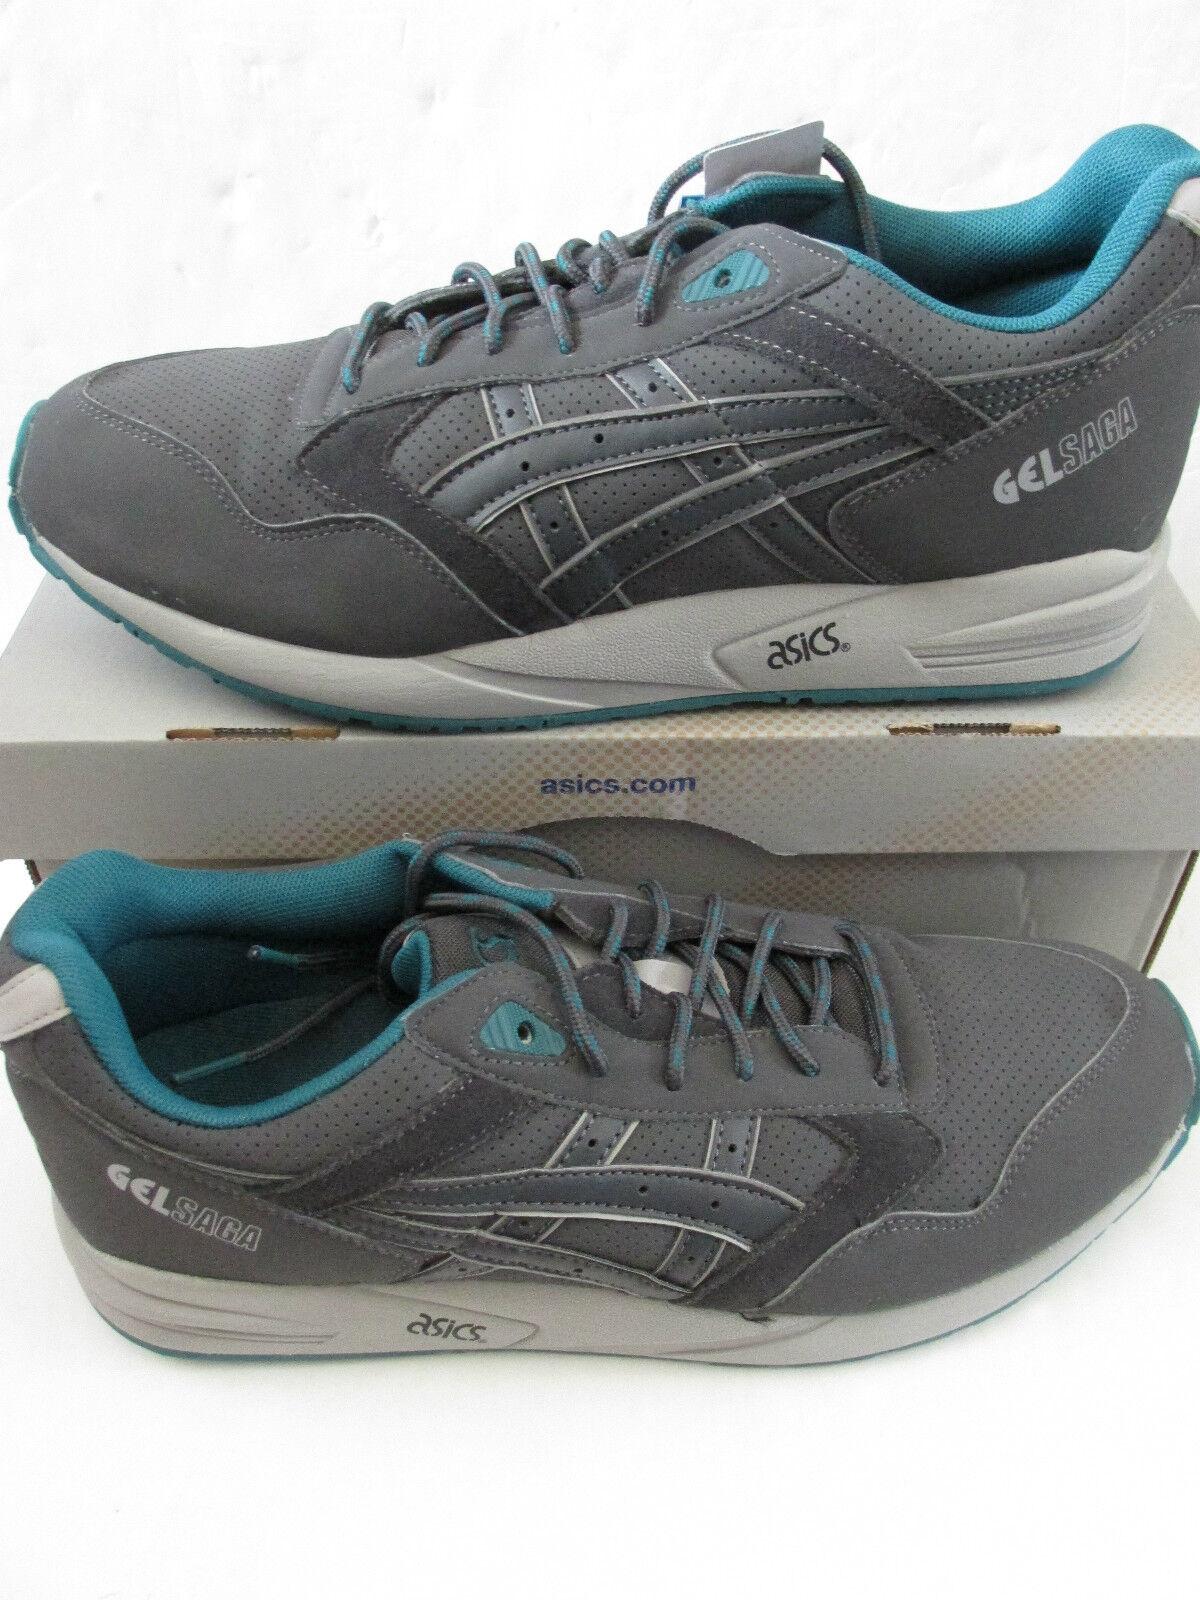 ASICS 1616 GEL Saga Sneaker Uomo h4a3y 1616 ASICS Scarpe Da Ginnastica Scarpe 4c3233